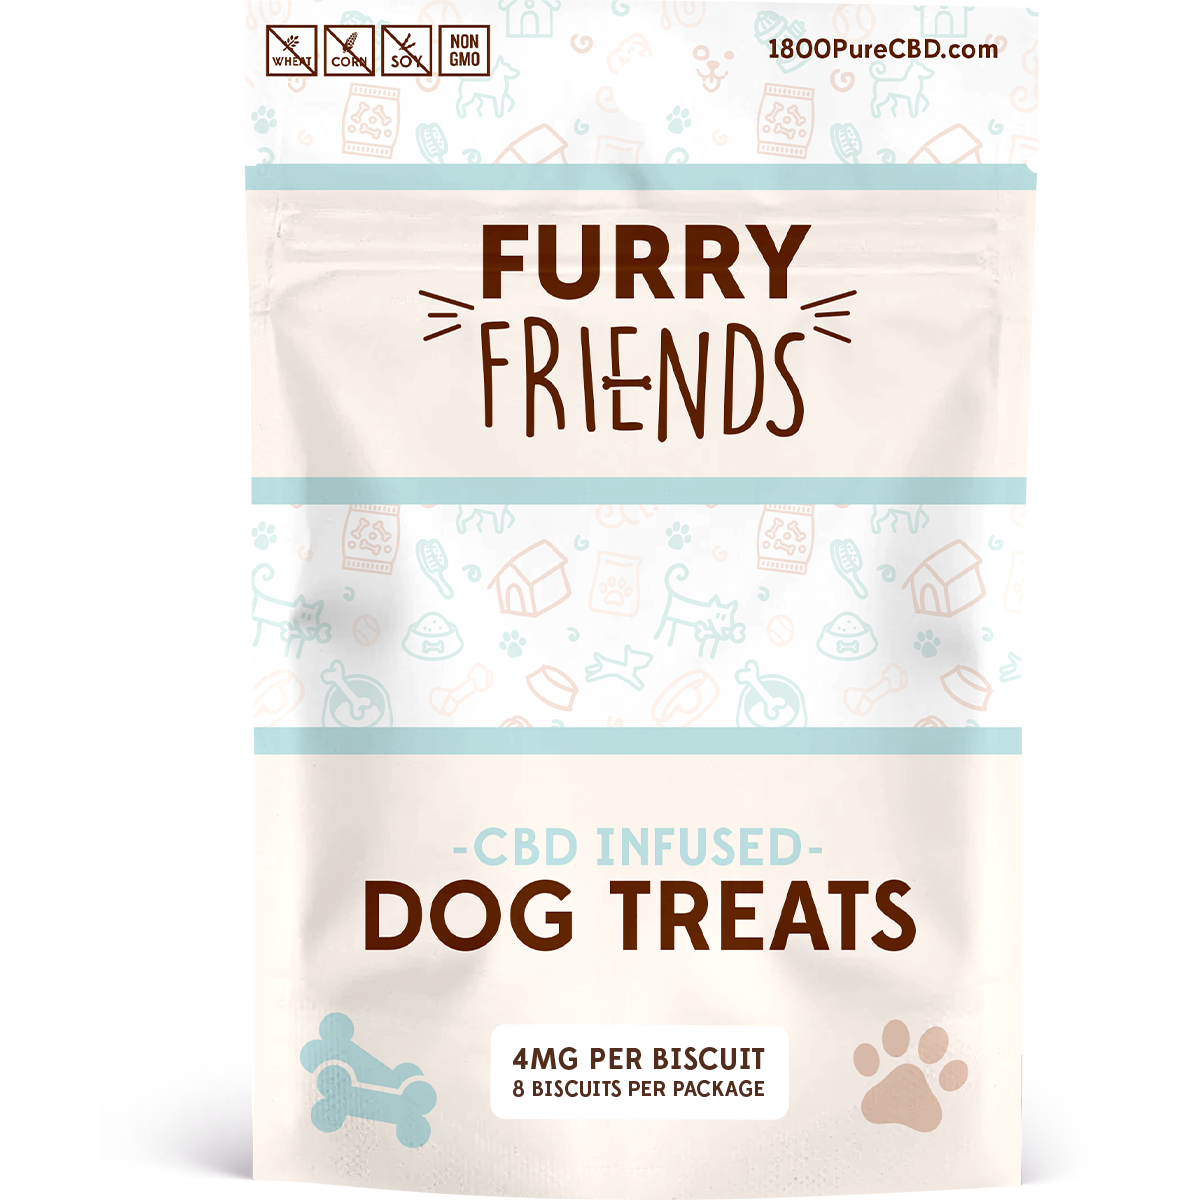 Furry Friends CBD Dog Treats 4mg front